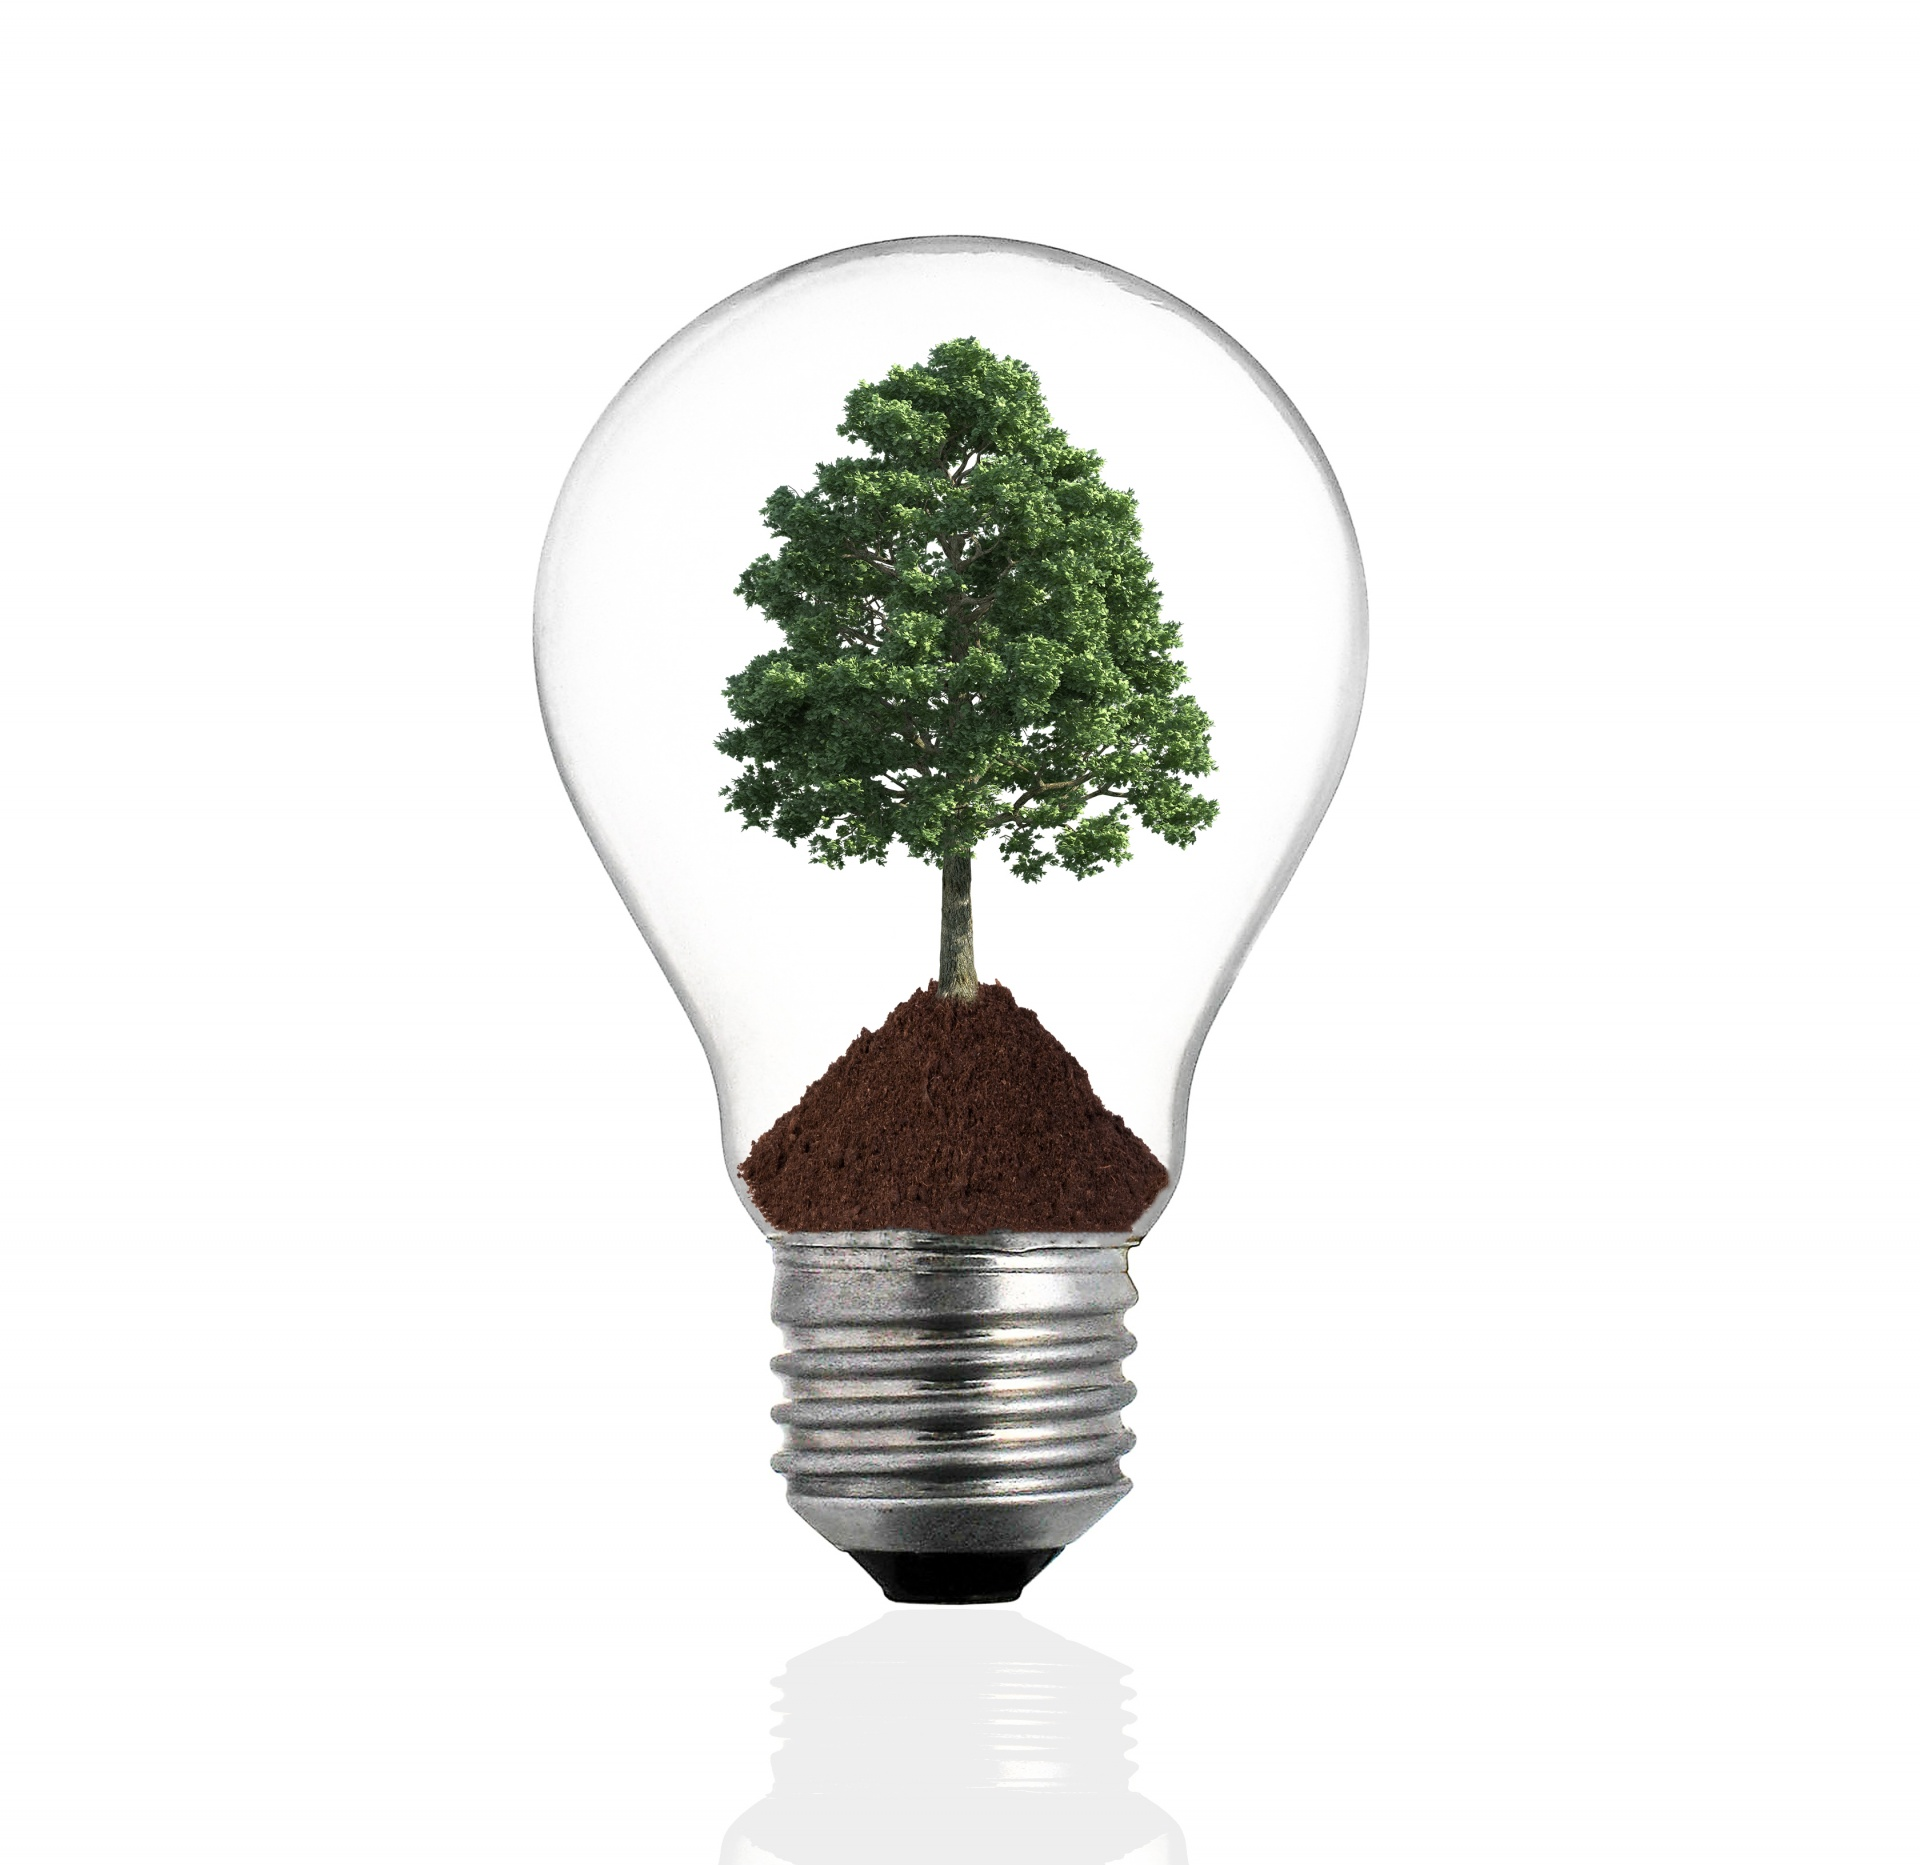 10 Bulb Garden Design Ideas: Garden Idea Image With Lightbulb And Tree